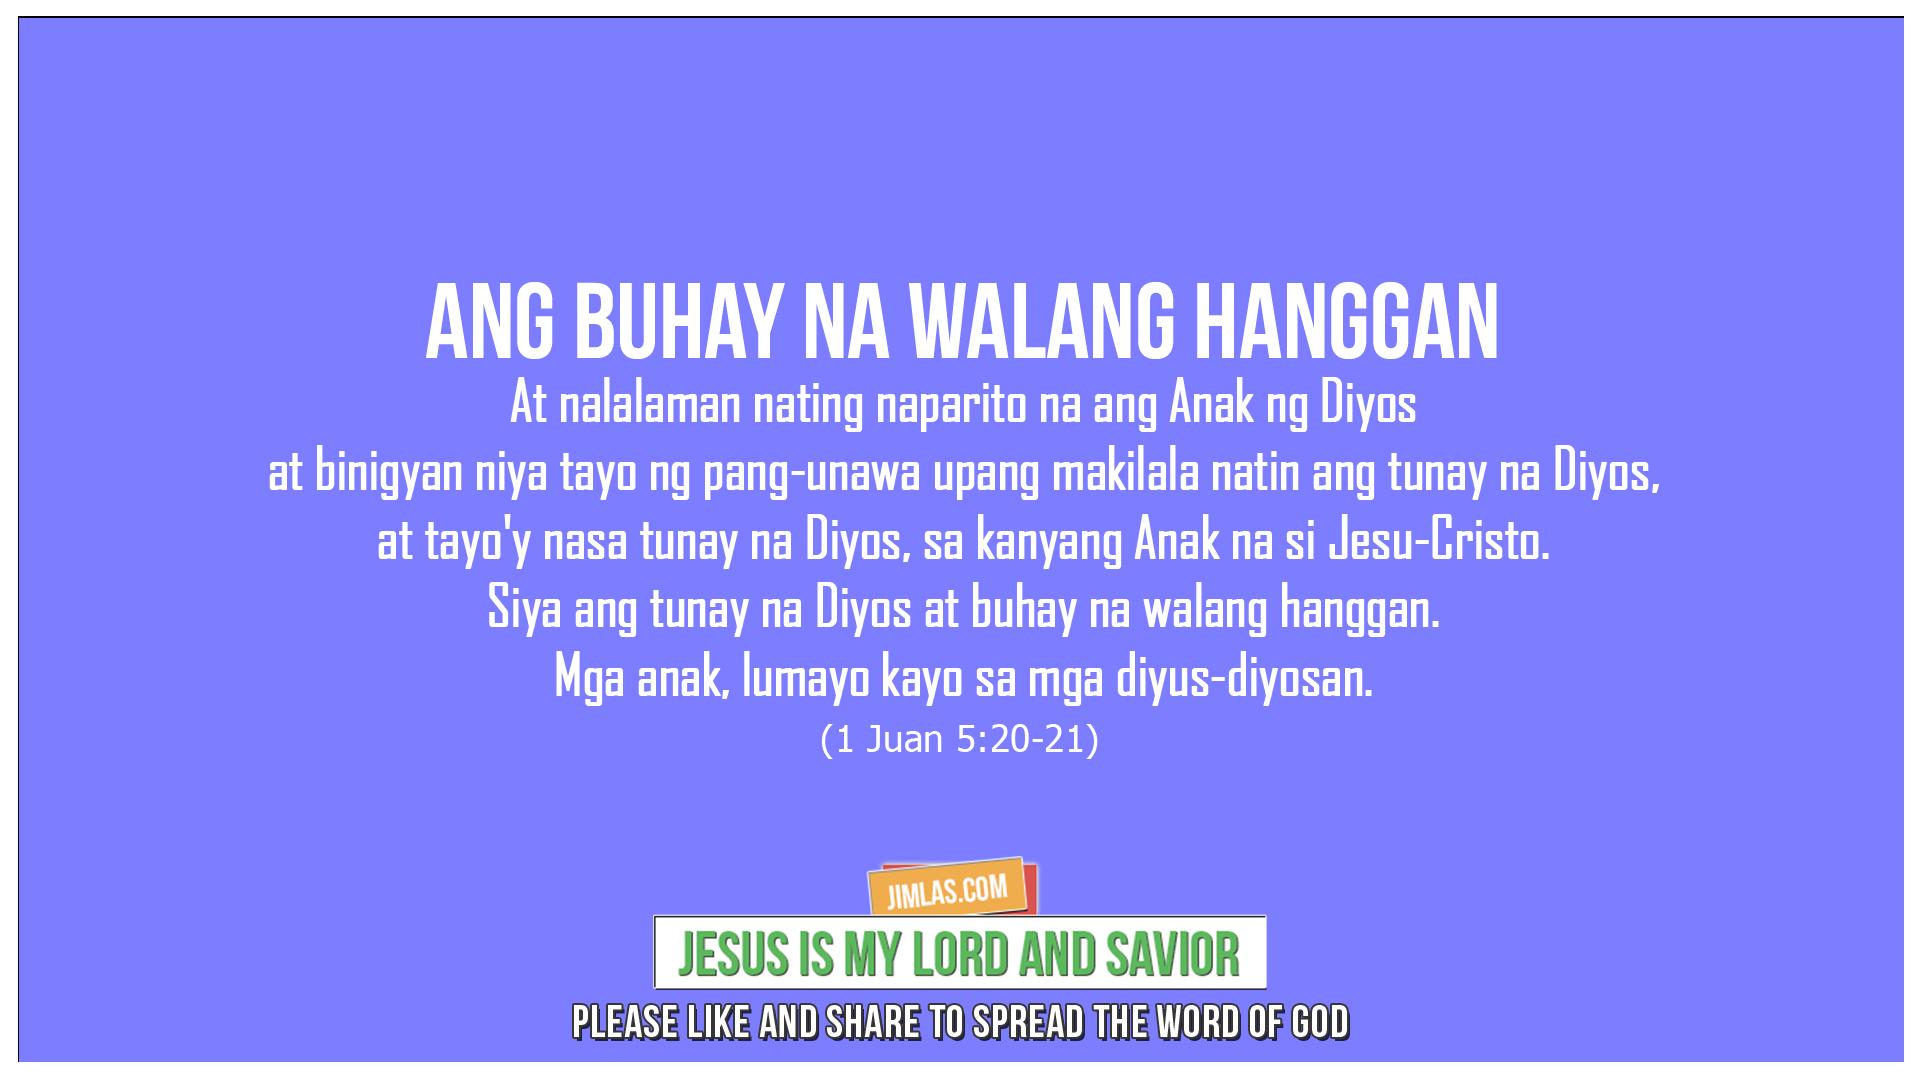 1 Juan 5:20-21, 1 Juan 5:20-21